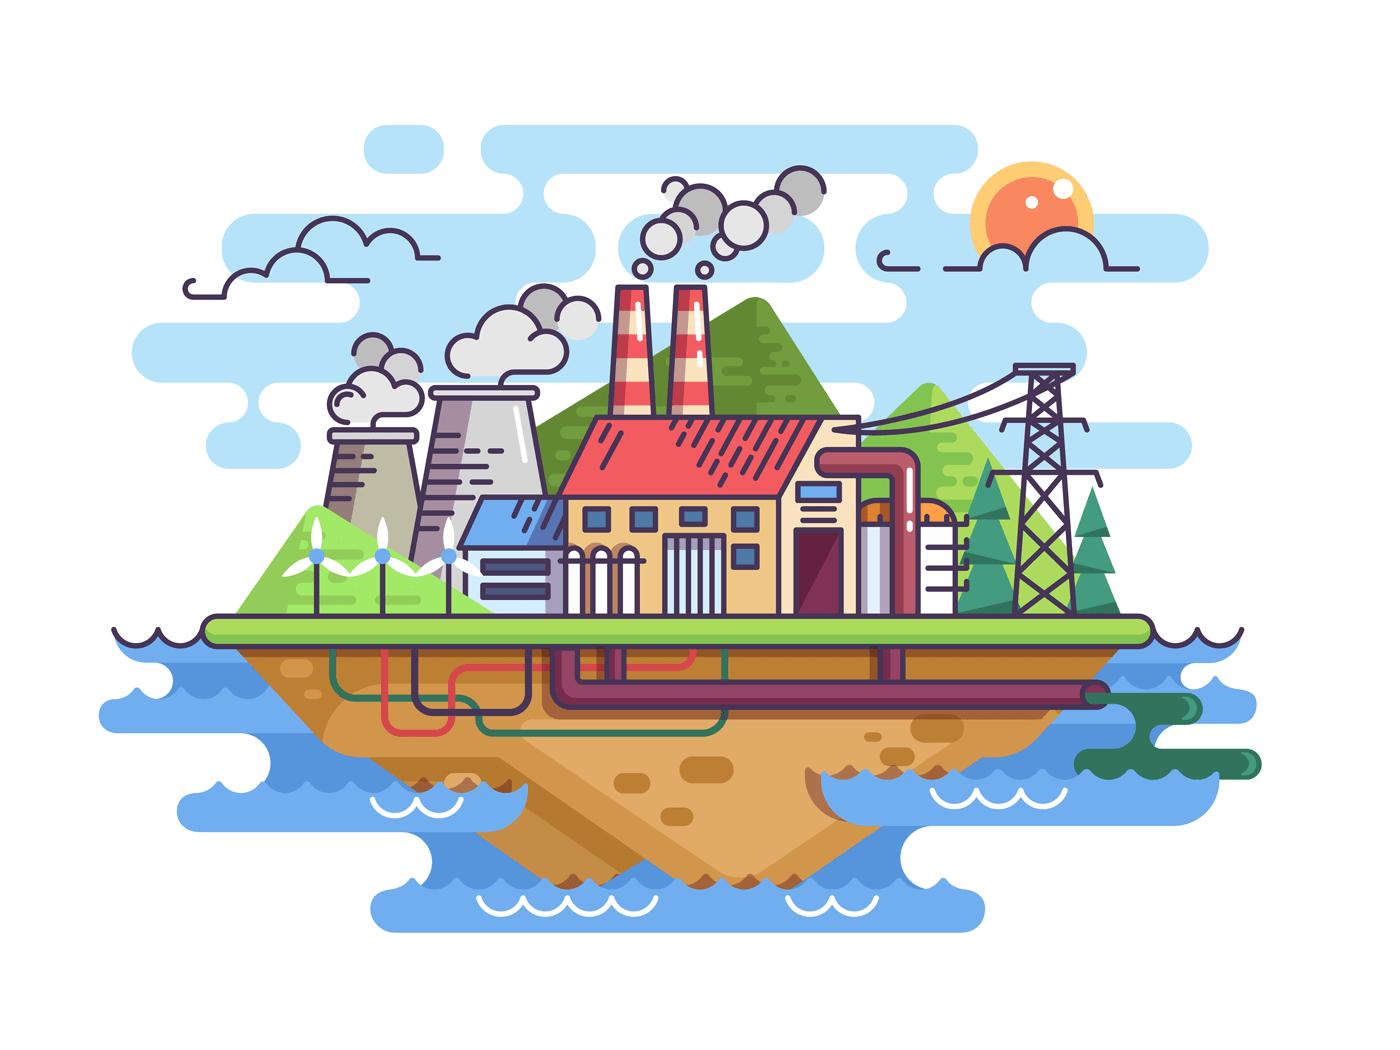 Factory plant on island illustration